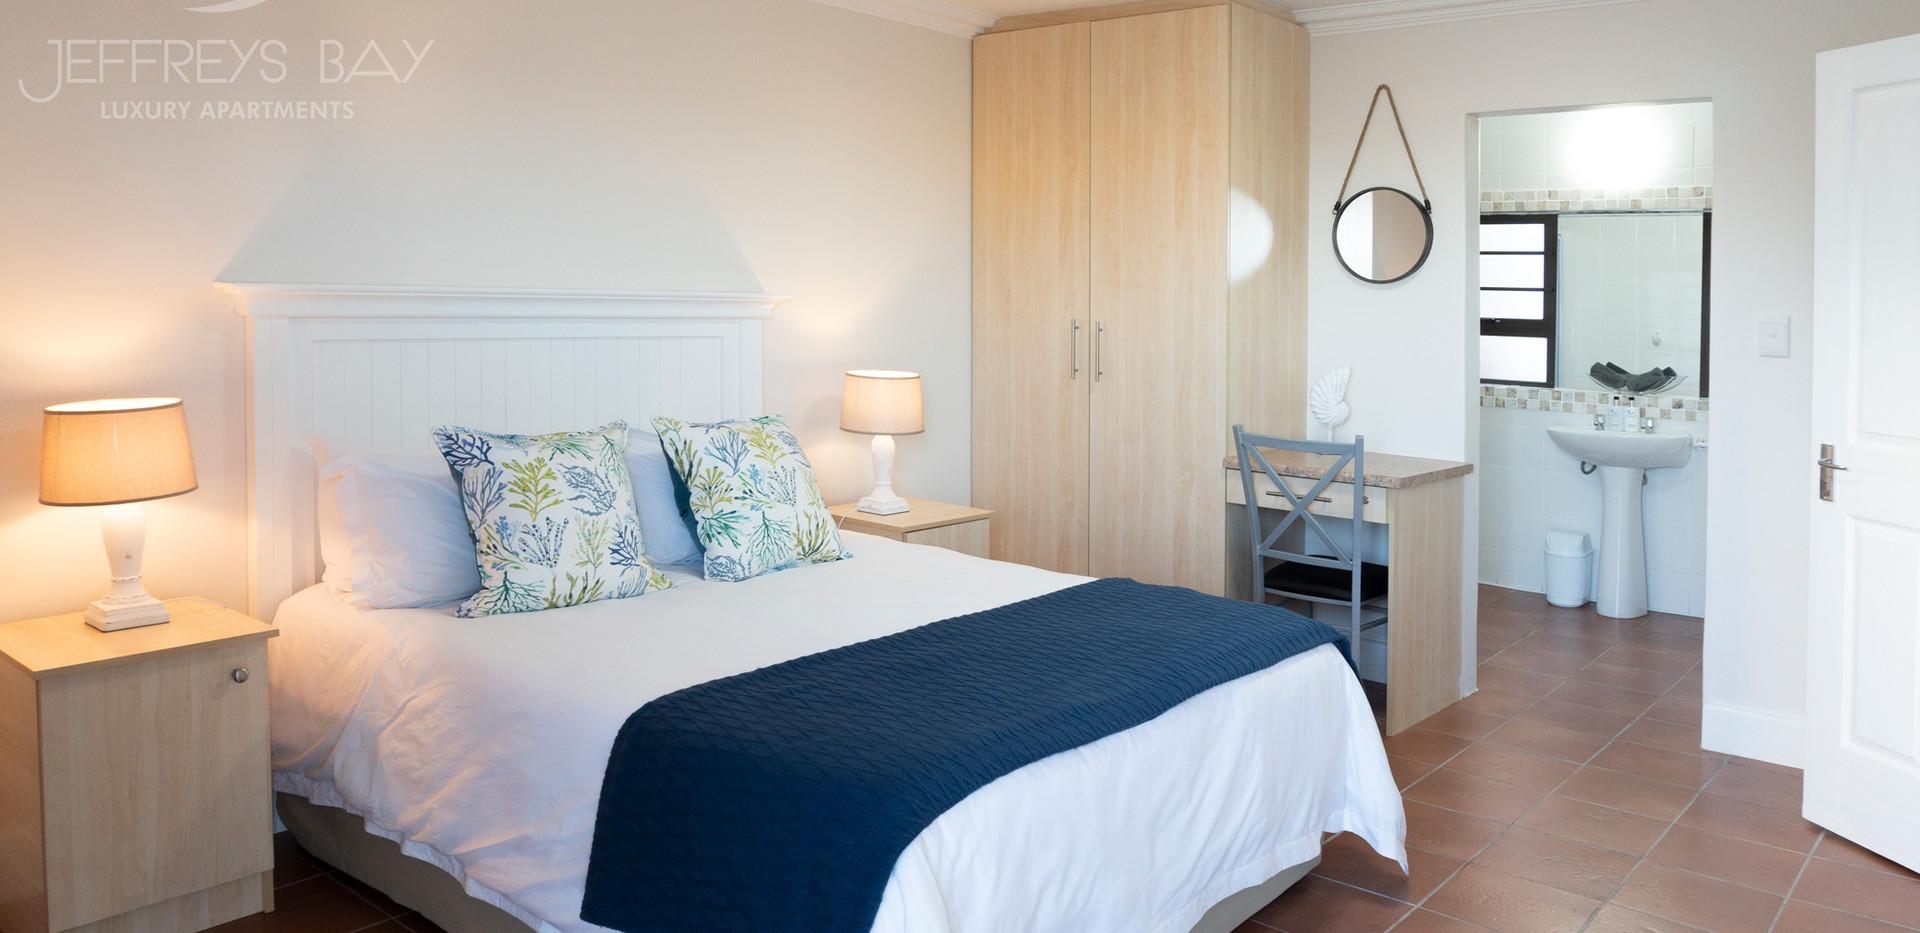 Jeffreysbay_Luxury_Apartments_Unit3_bed1